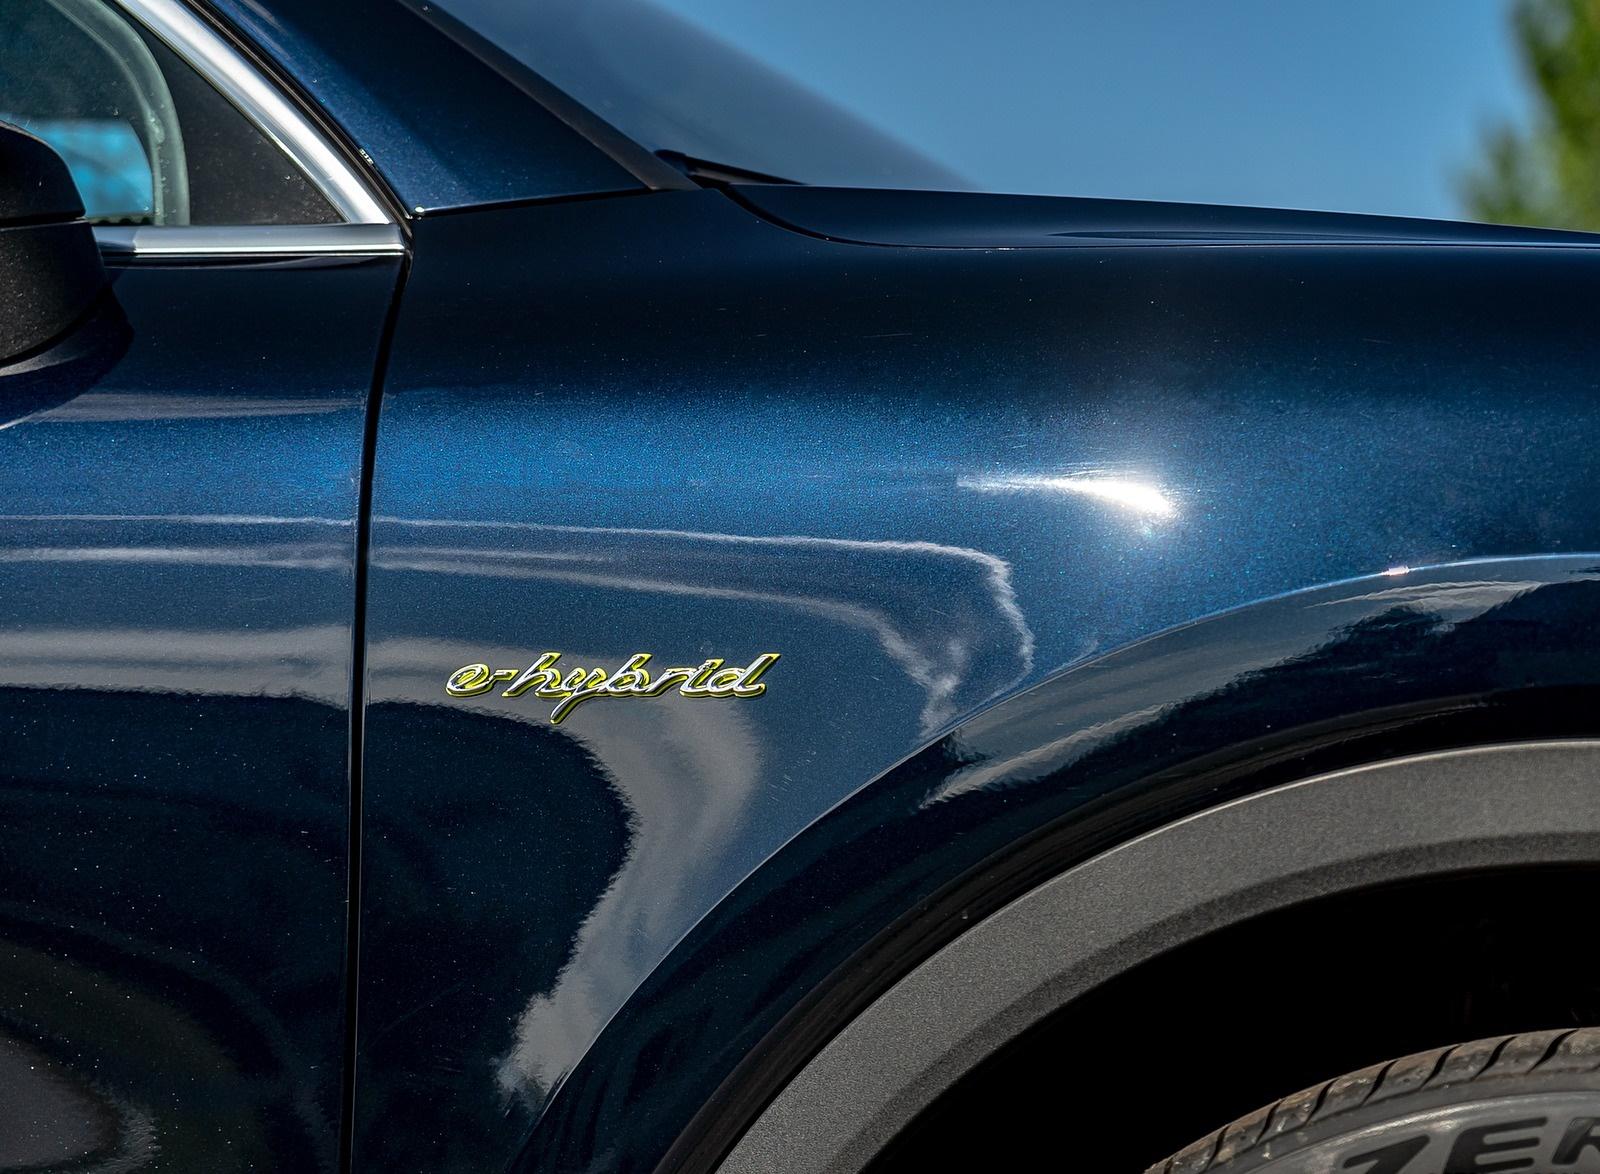 2019 Porsche Cayenne E-Hybrid (US-Spec) Detail Wallpapers #25 of 37